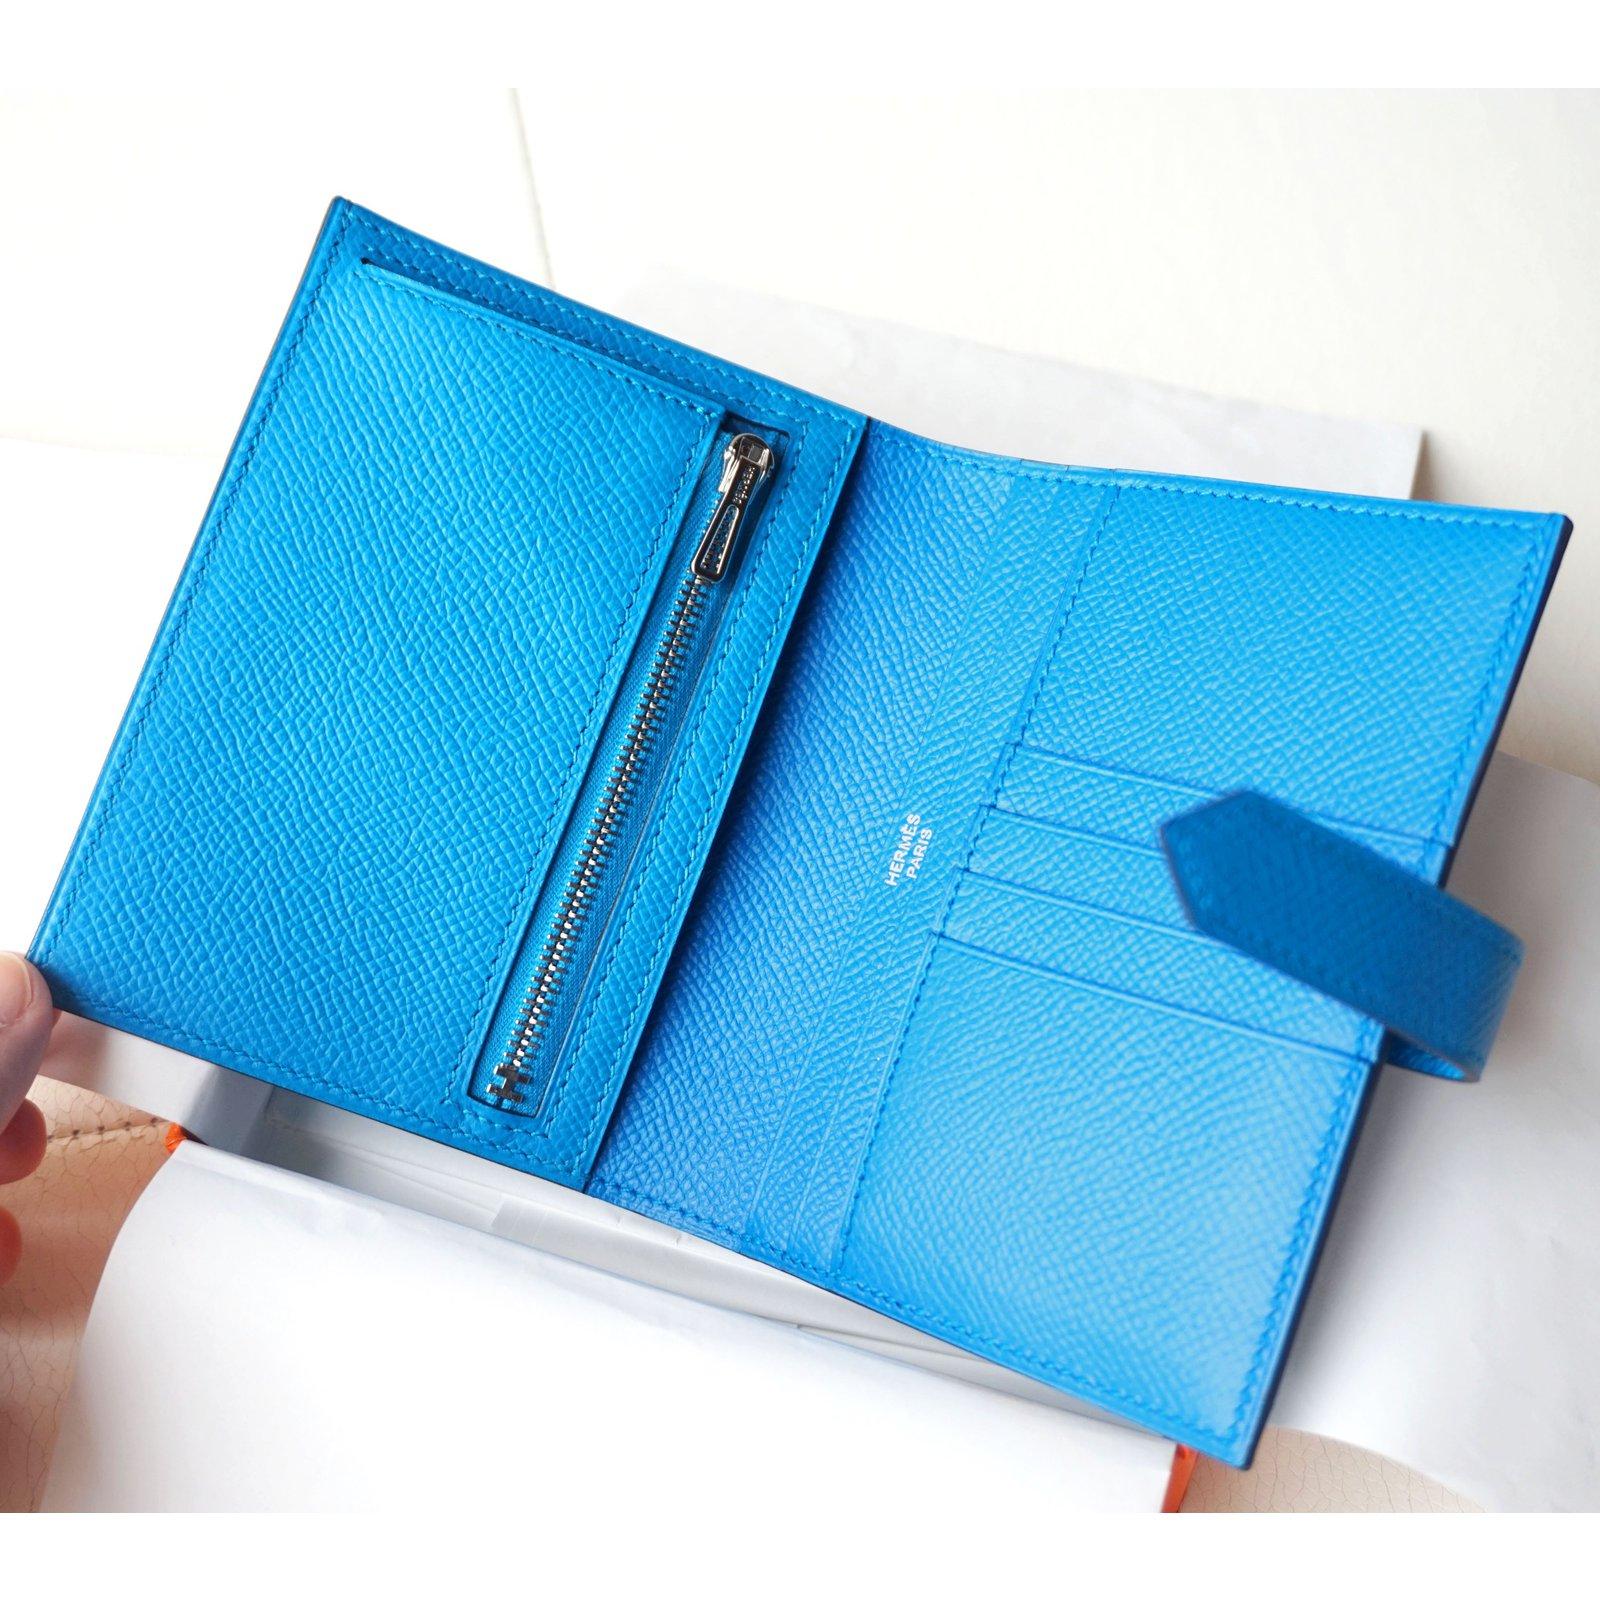 40400a5d2d70 Hermès Béarn compact wallet Wallets Leather Blue ref.47513 - Joli Closet